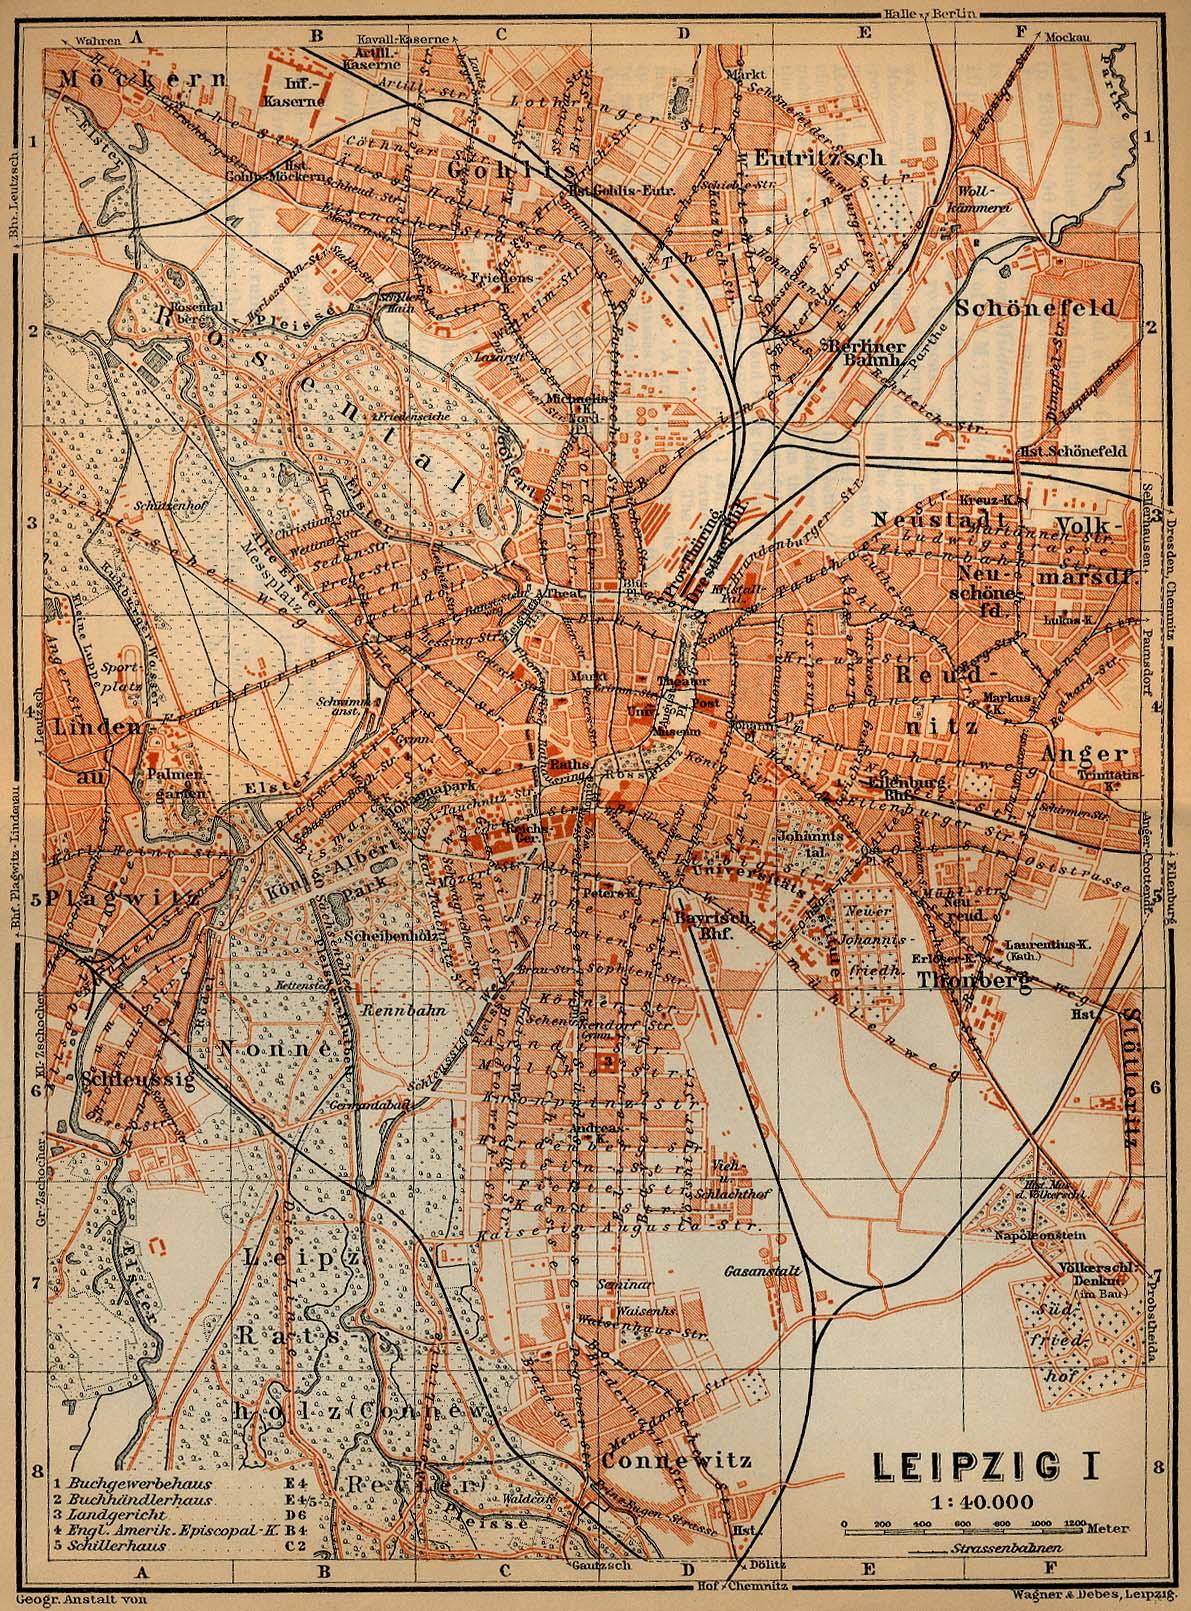 Mapa de Leipzig, Alemania 1910